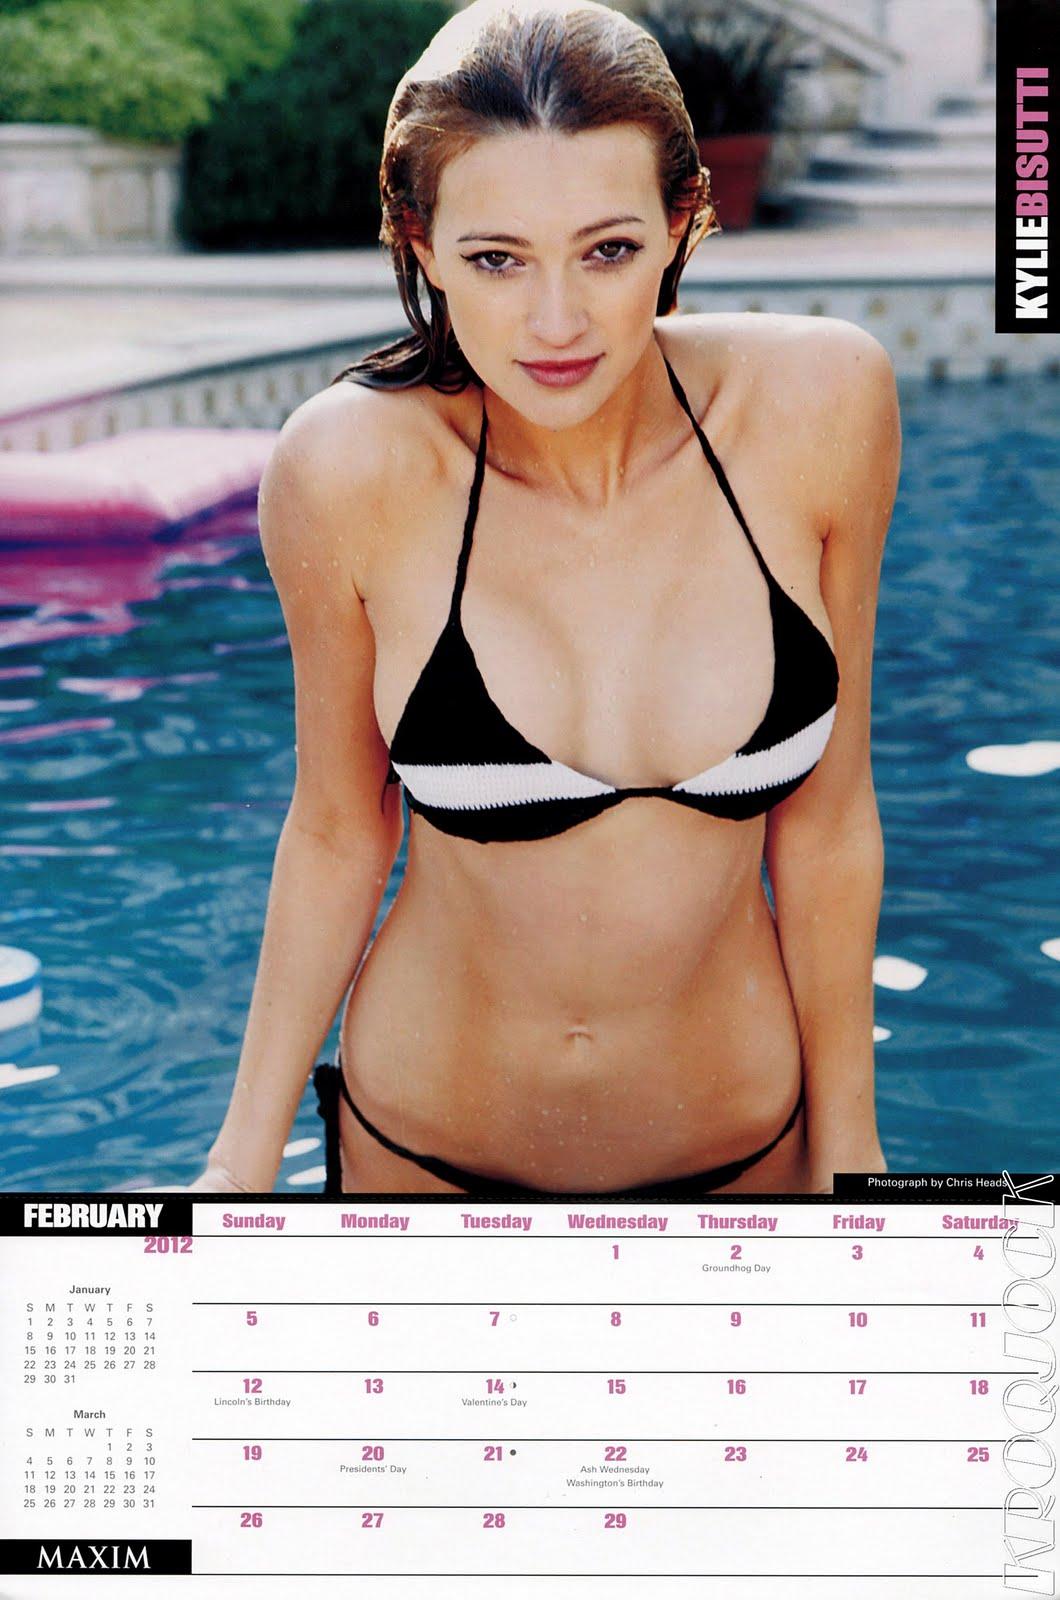 Maxim Magazine Calendar 2012